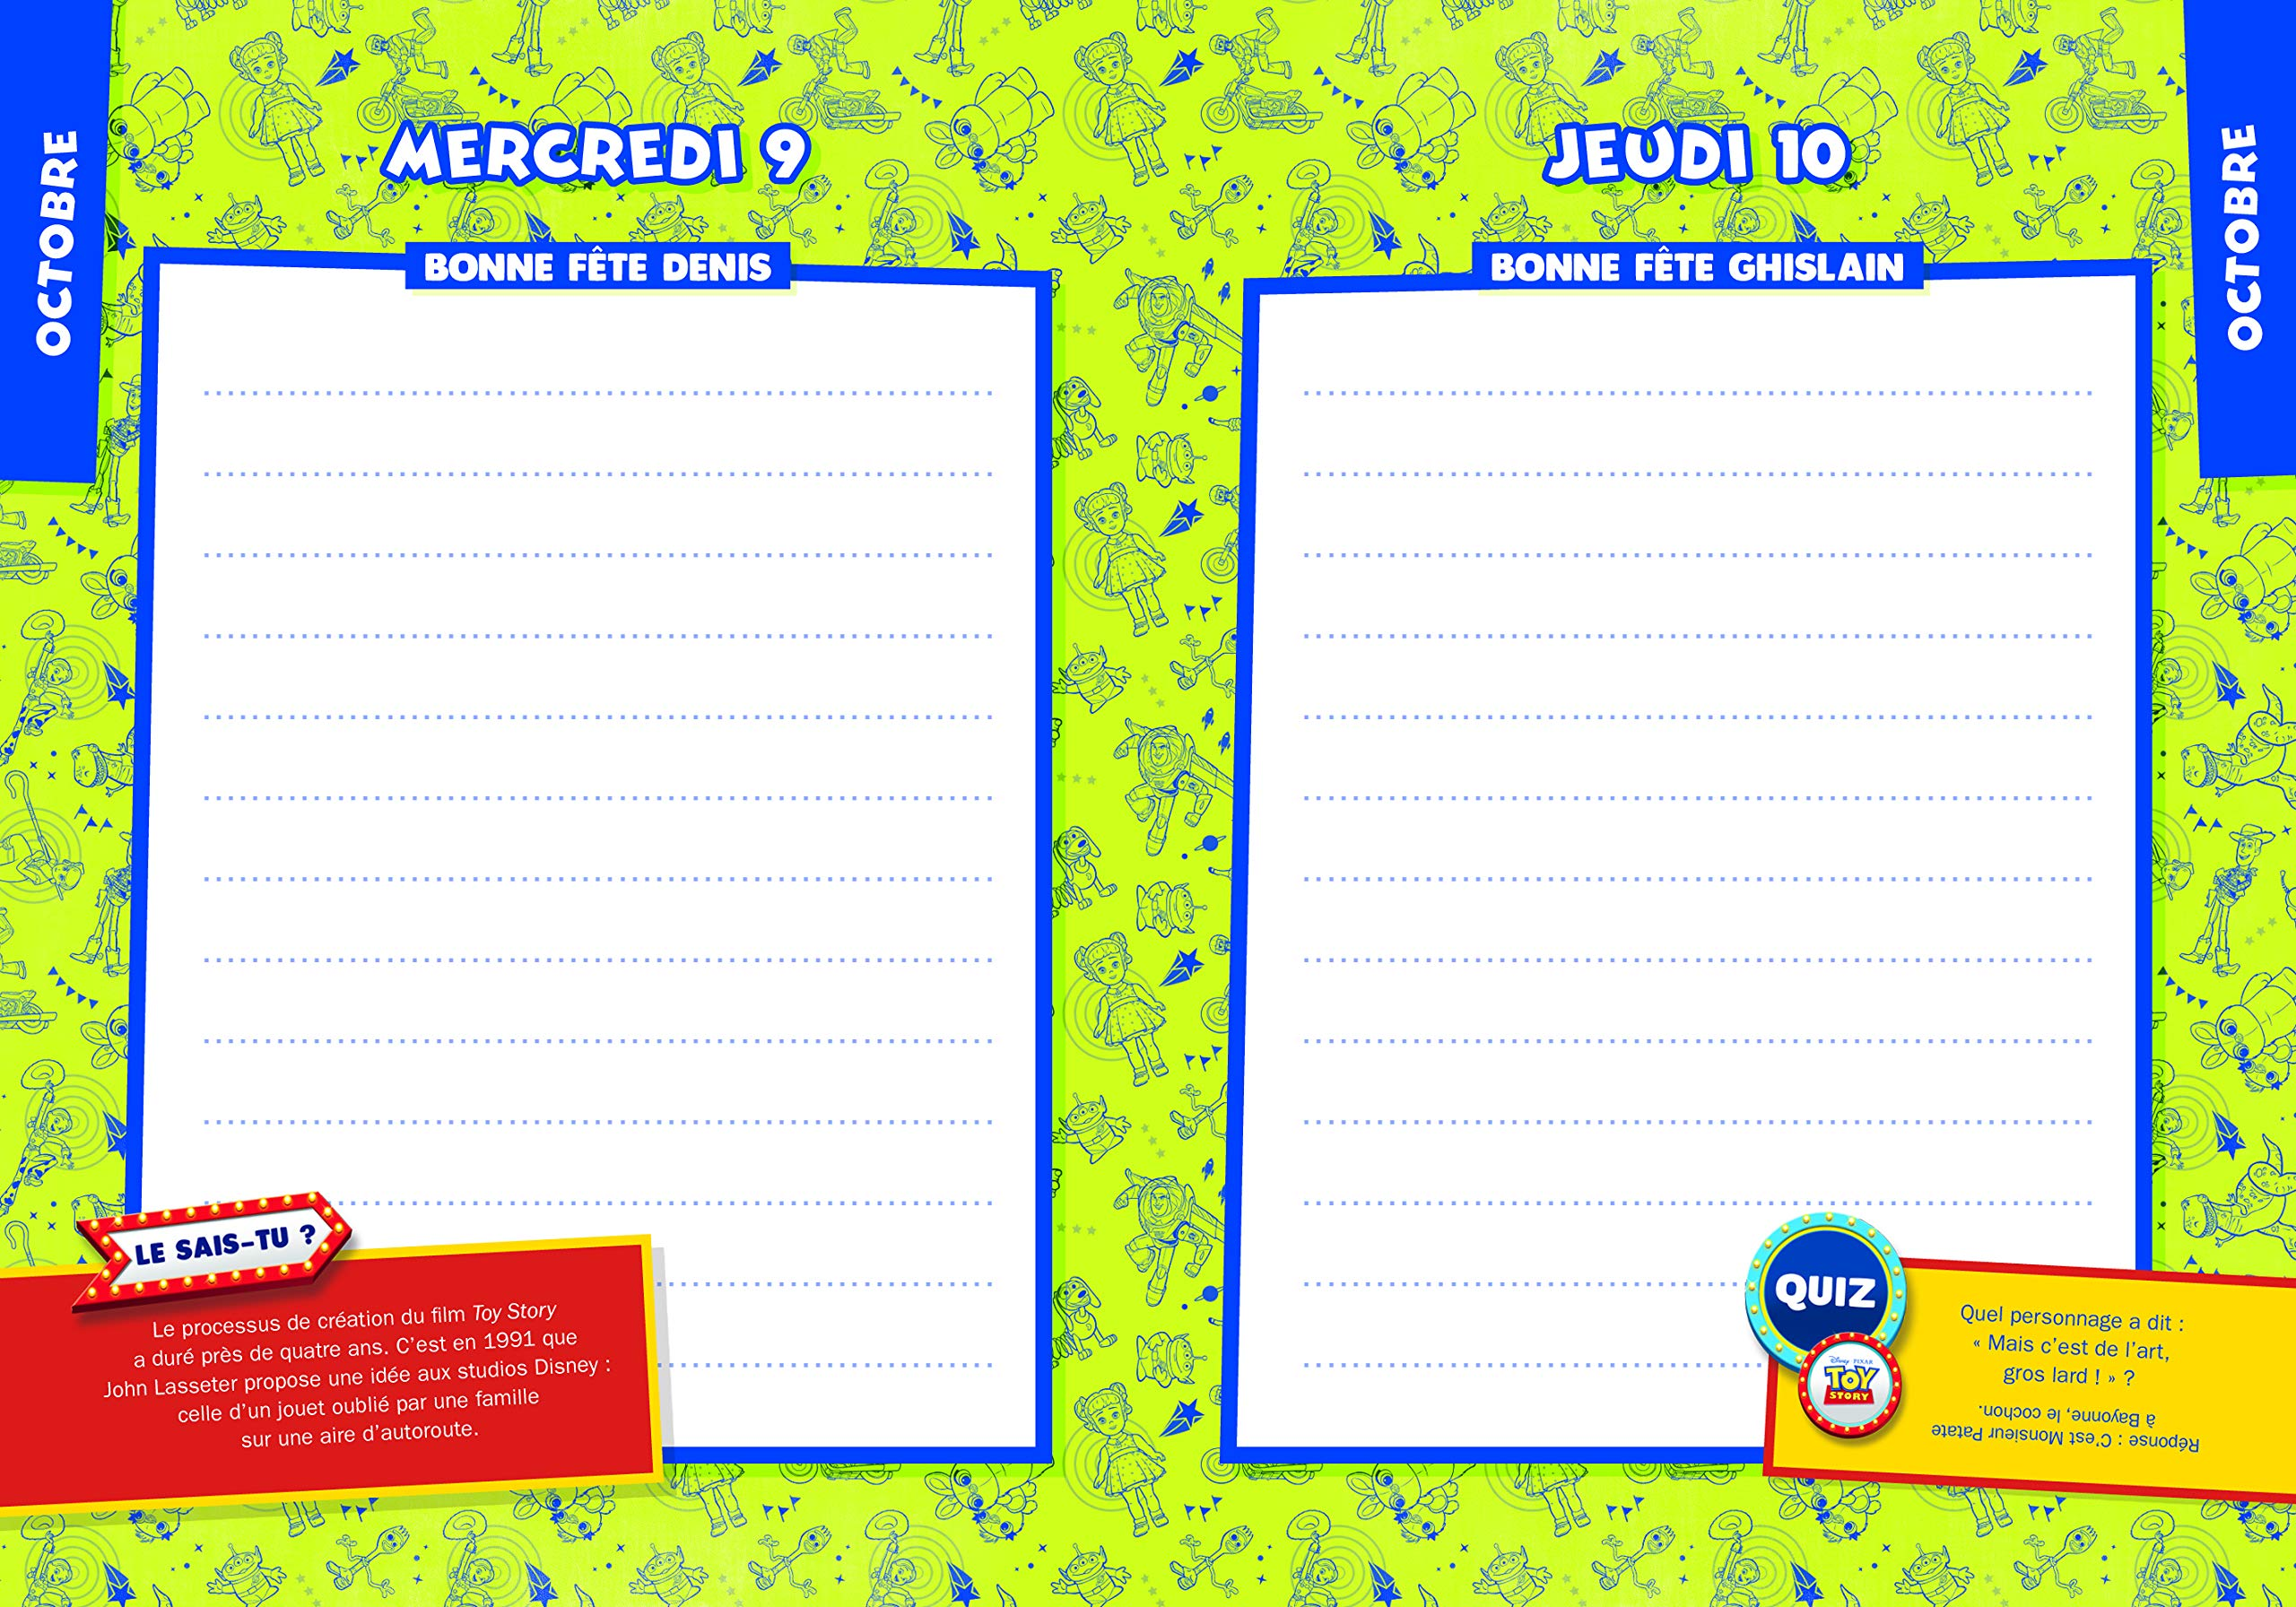 TOY STORY - Agenda 2019-2020 - Disney Pixar: Amazon.es ...